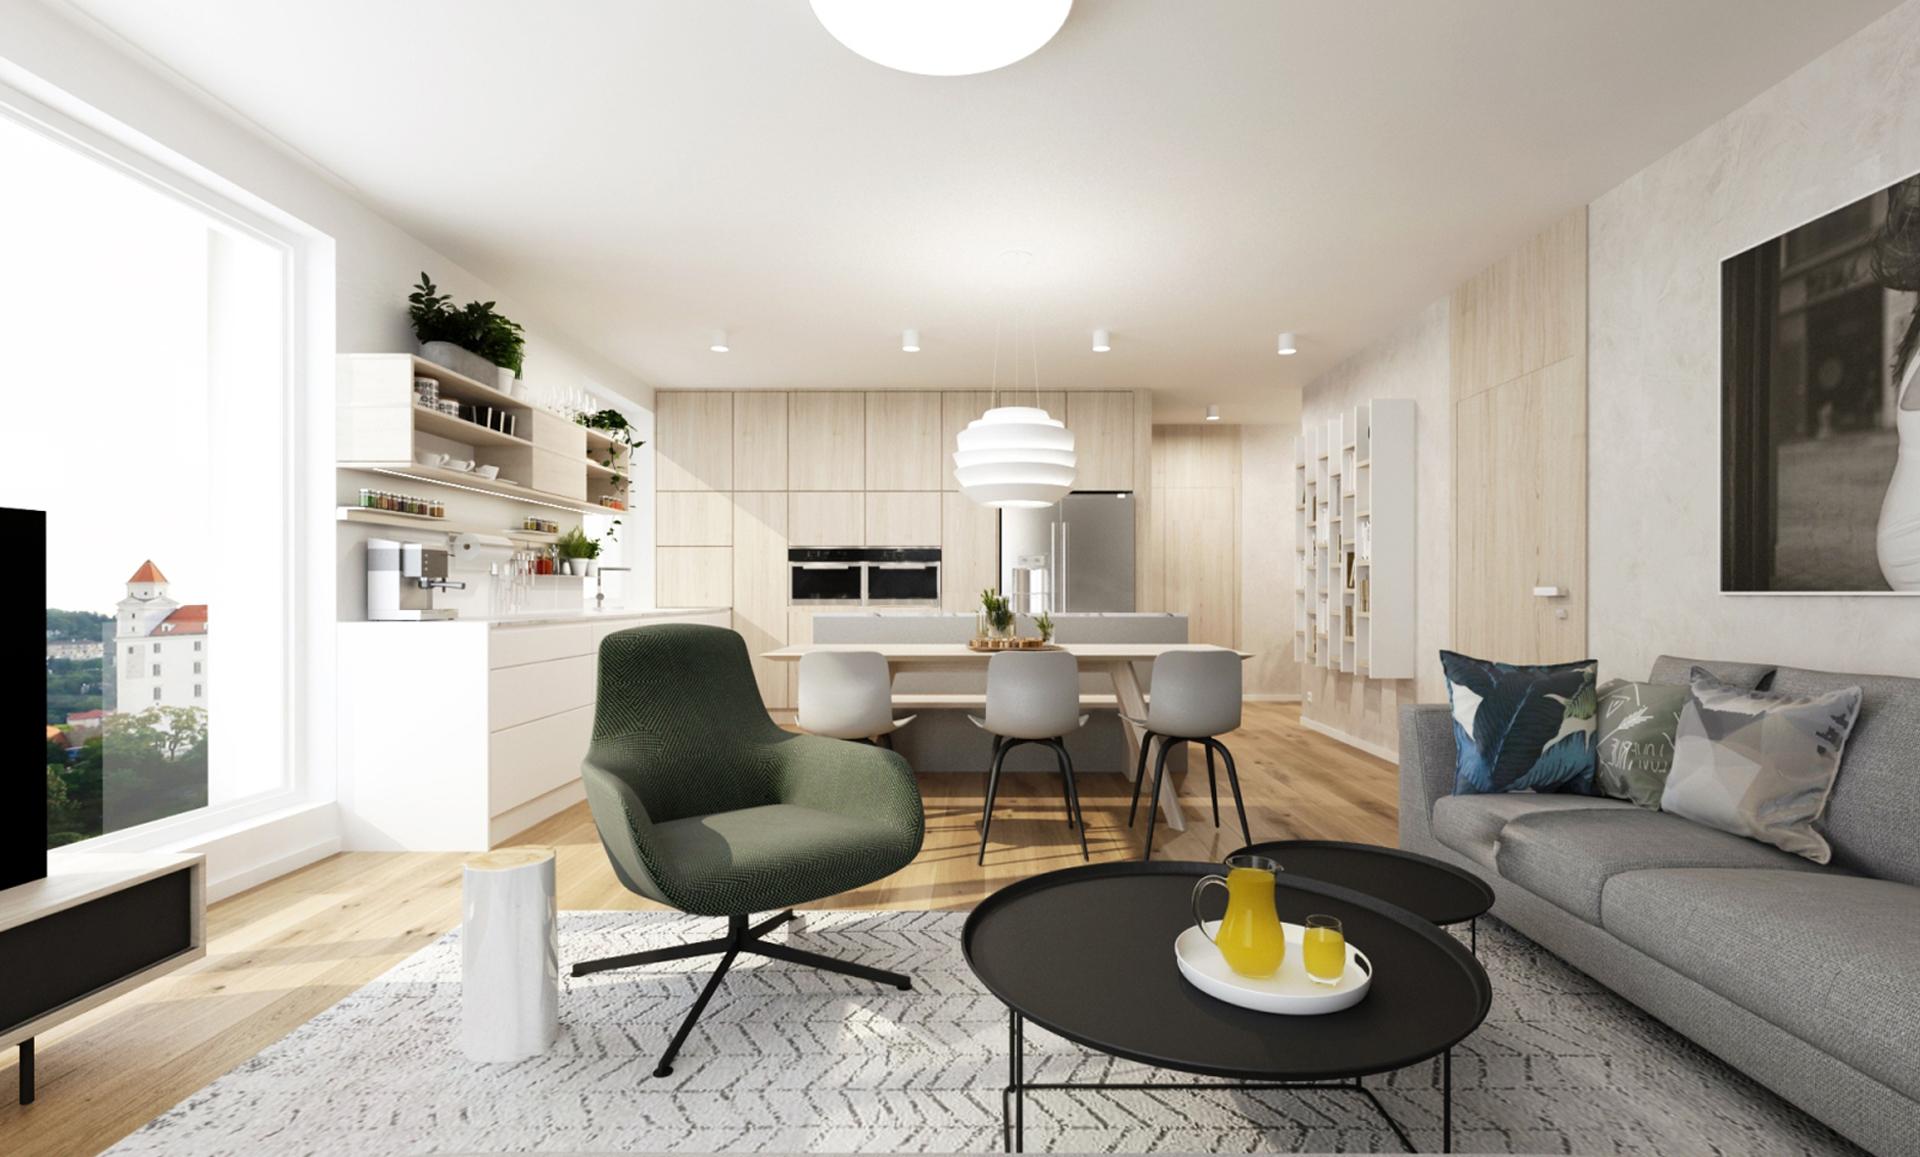 navrh interieru bytu, navrh interieru kocelova, rezidencia kocelova, navrh interieru kuchyne, vizualizacie kuchyne, vizualizacie, navrh kuchyne, dizajn jedalne, interierovy dizajner, hay chair, foscarini, le soleil, zanotta, kent armchair, interierovy dizajn, bieleny dub, navrh kuchyne s jedalnou, navrh penthouse bratislava, navrh interieru holobytu, navrh interieru bratislava